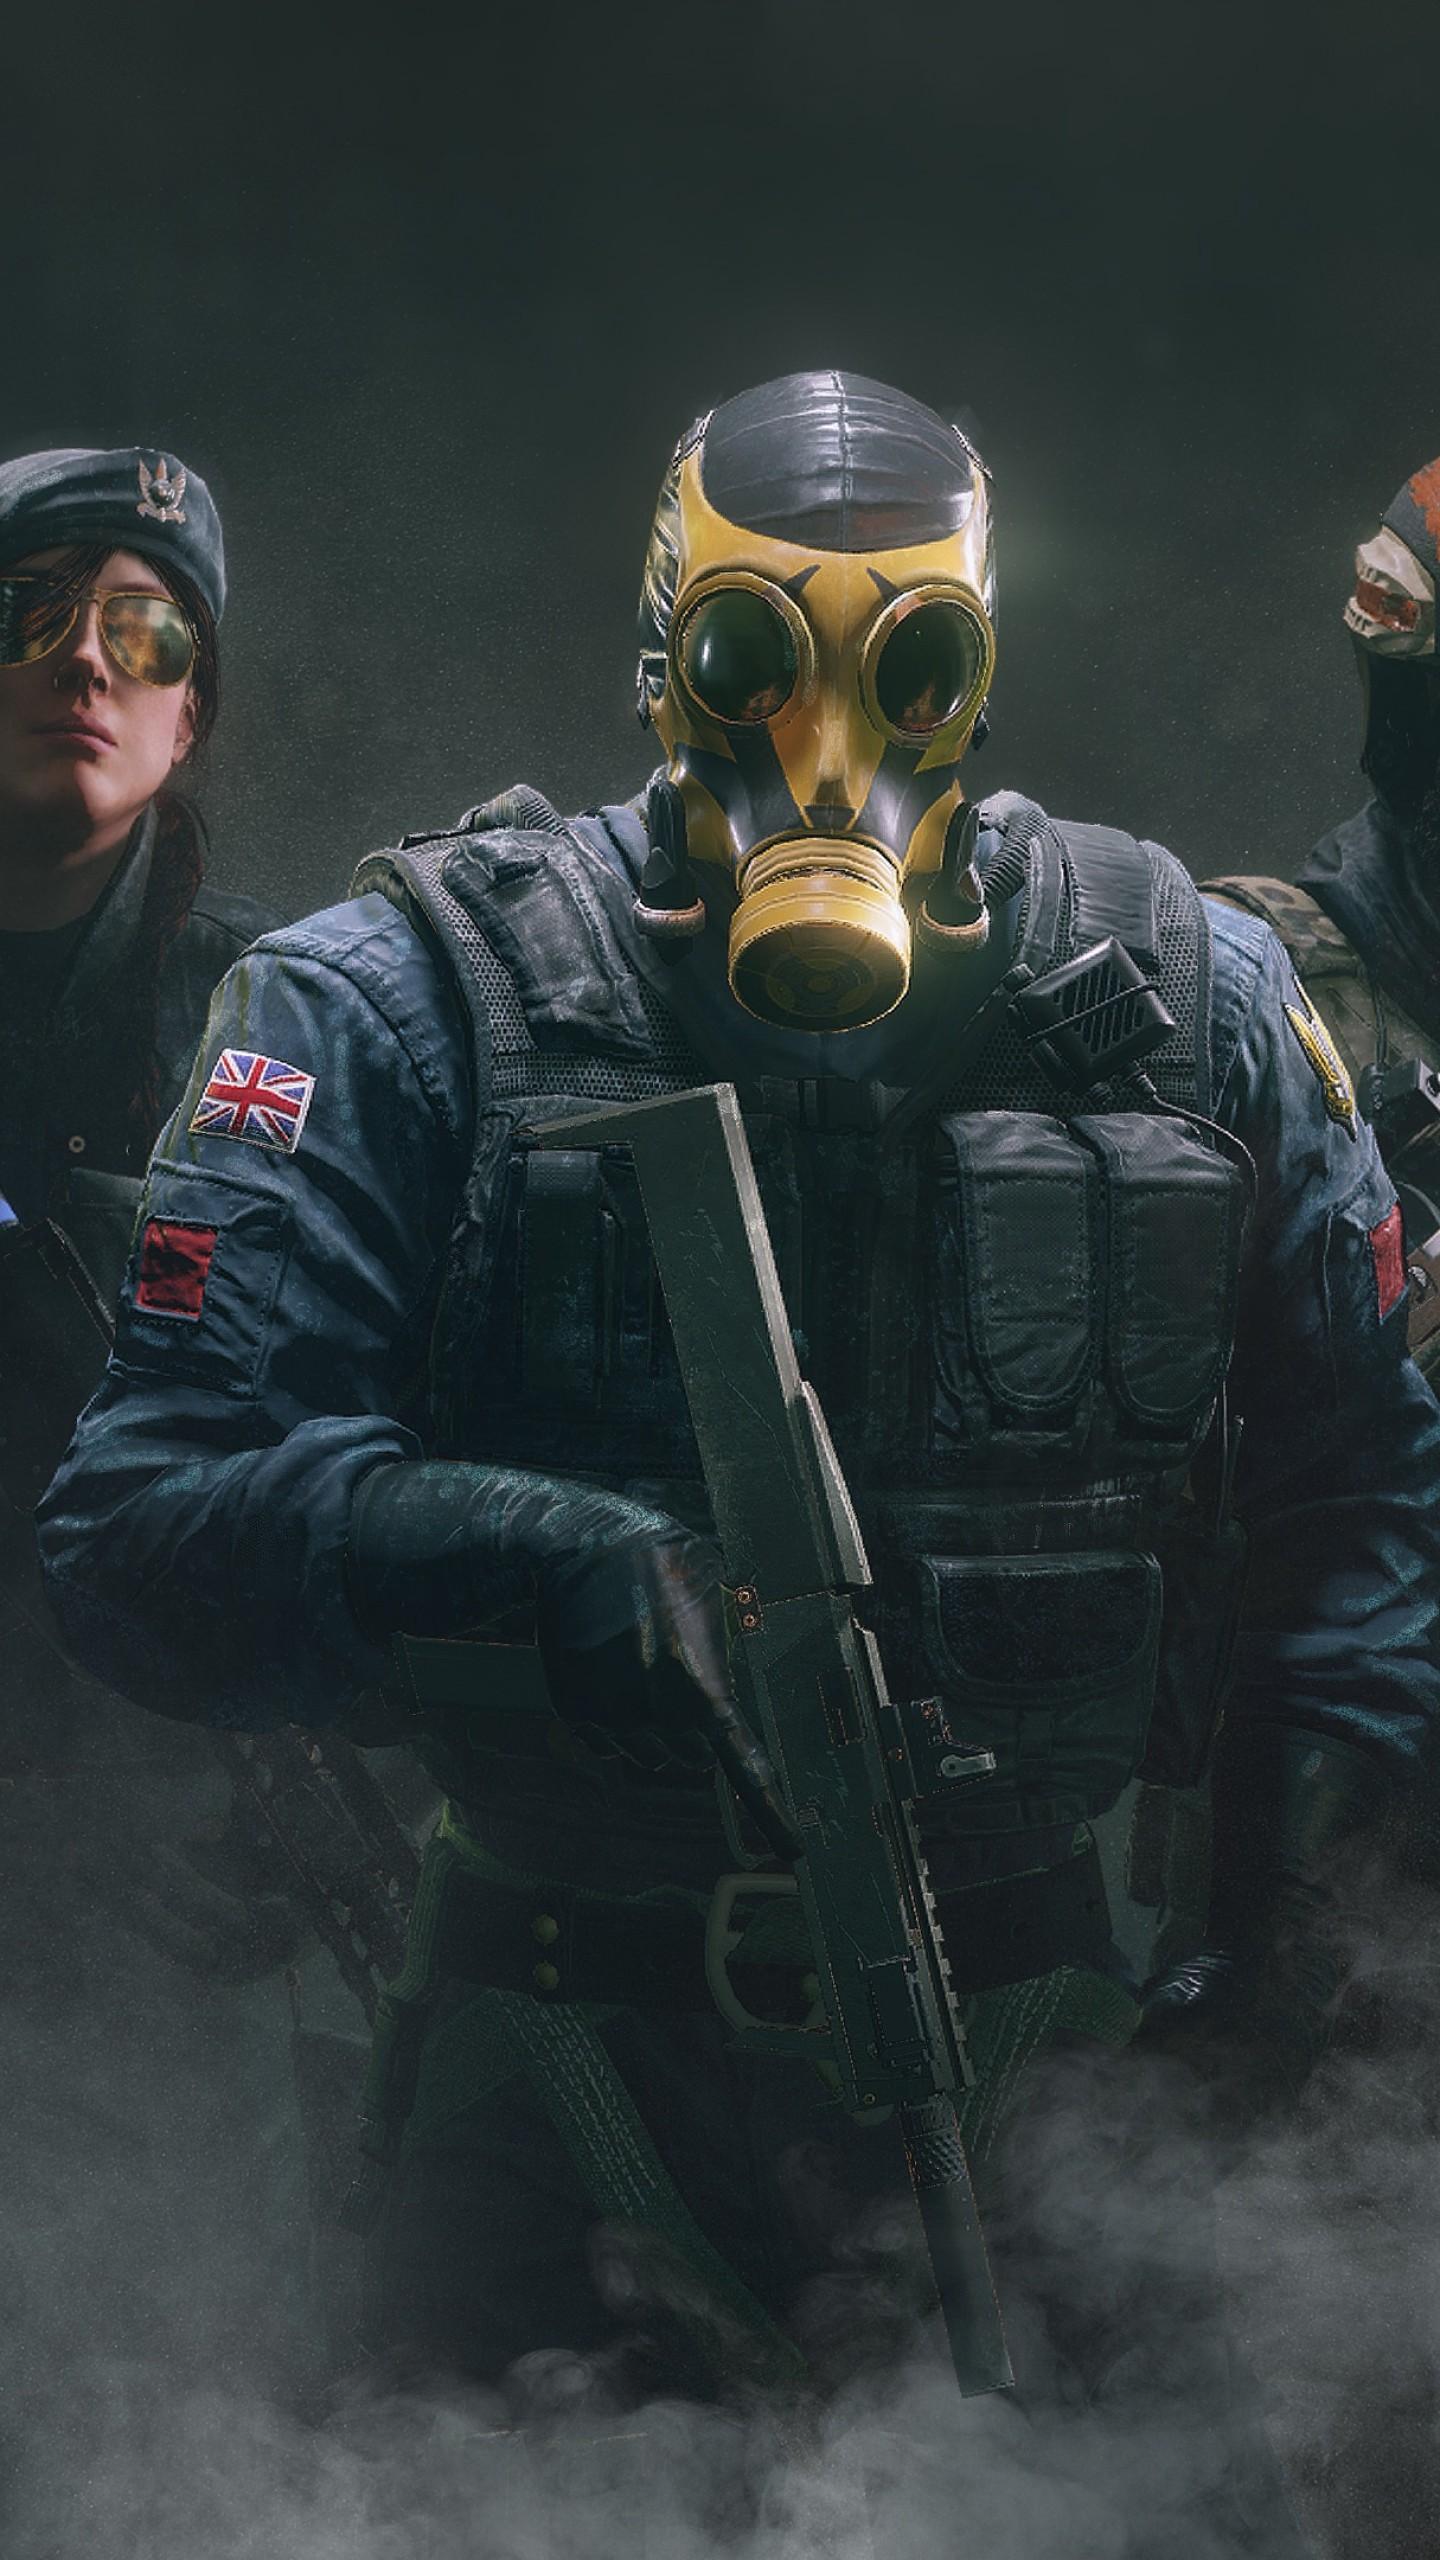 Wallpaper Tom Clancy S Rainbow Six Siege Operation Black Ice Best Games Games 10749